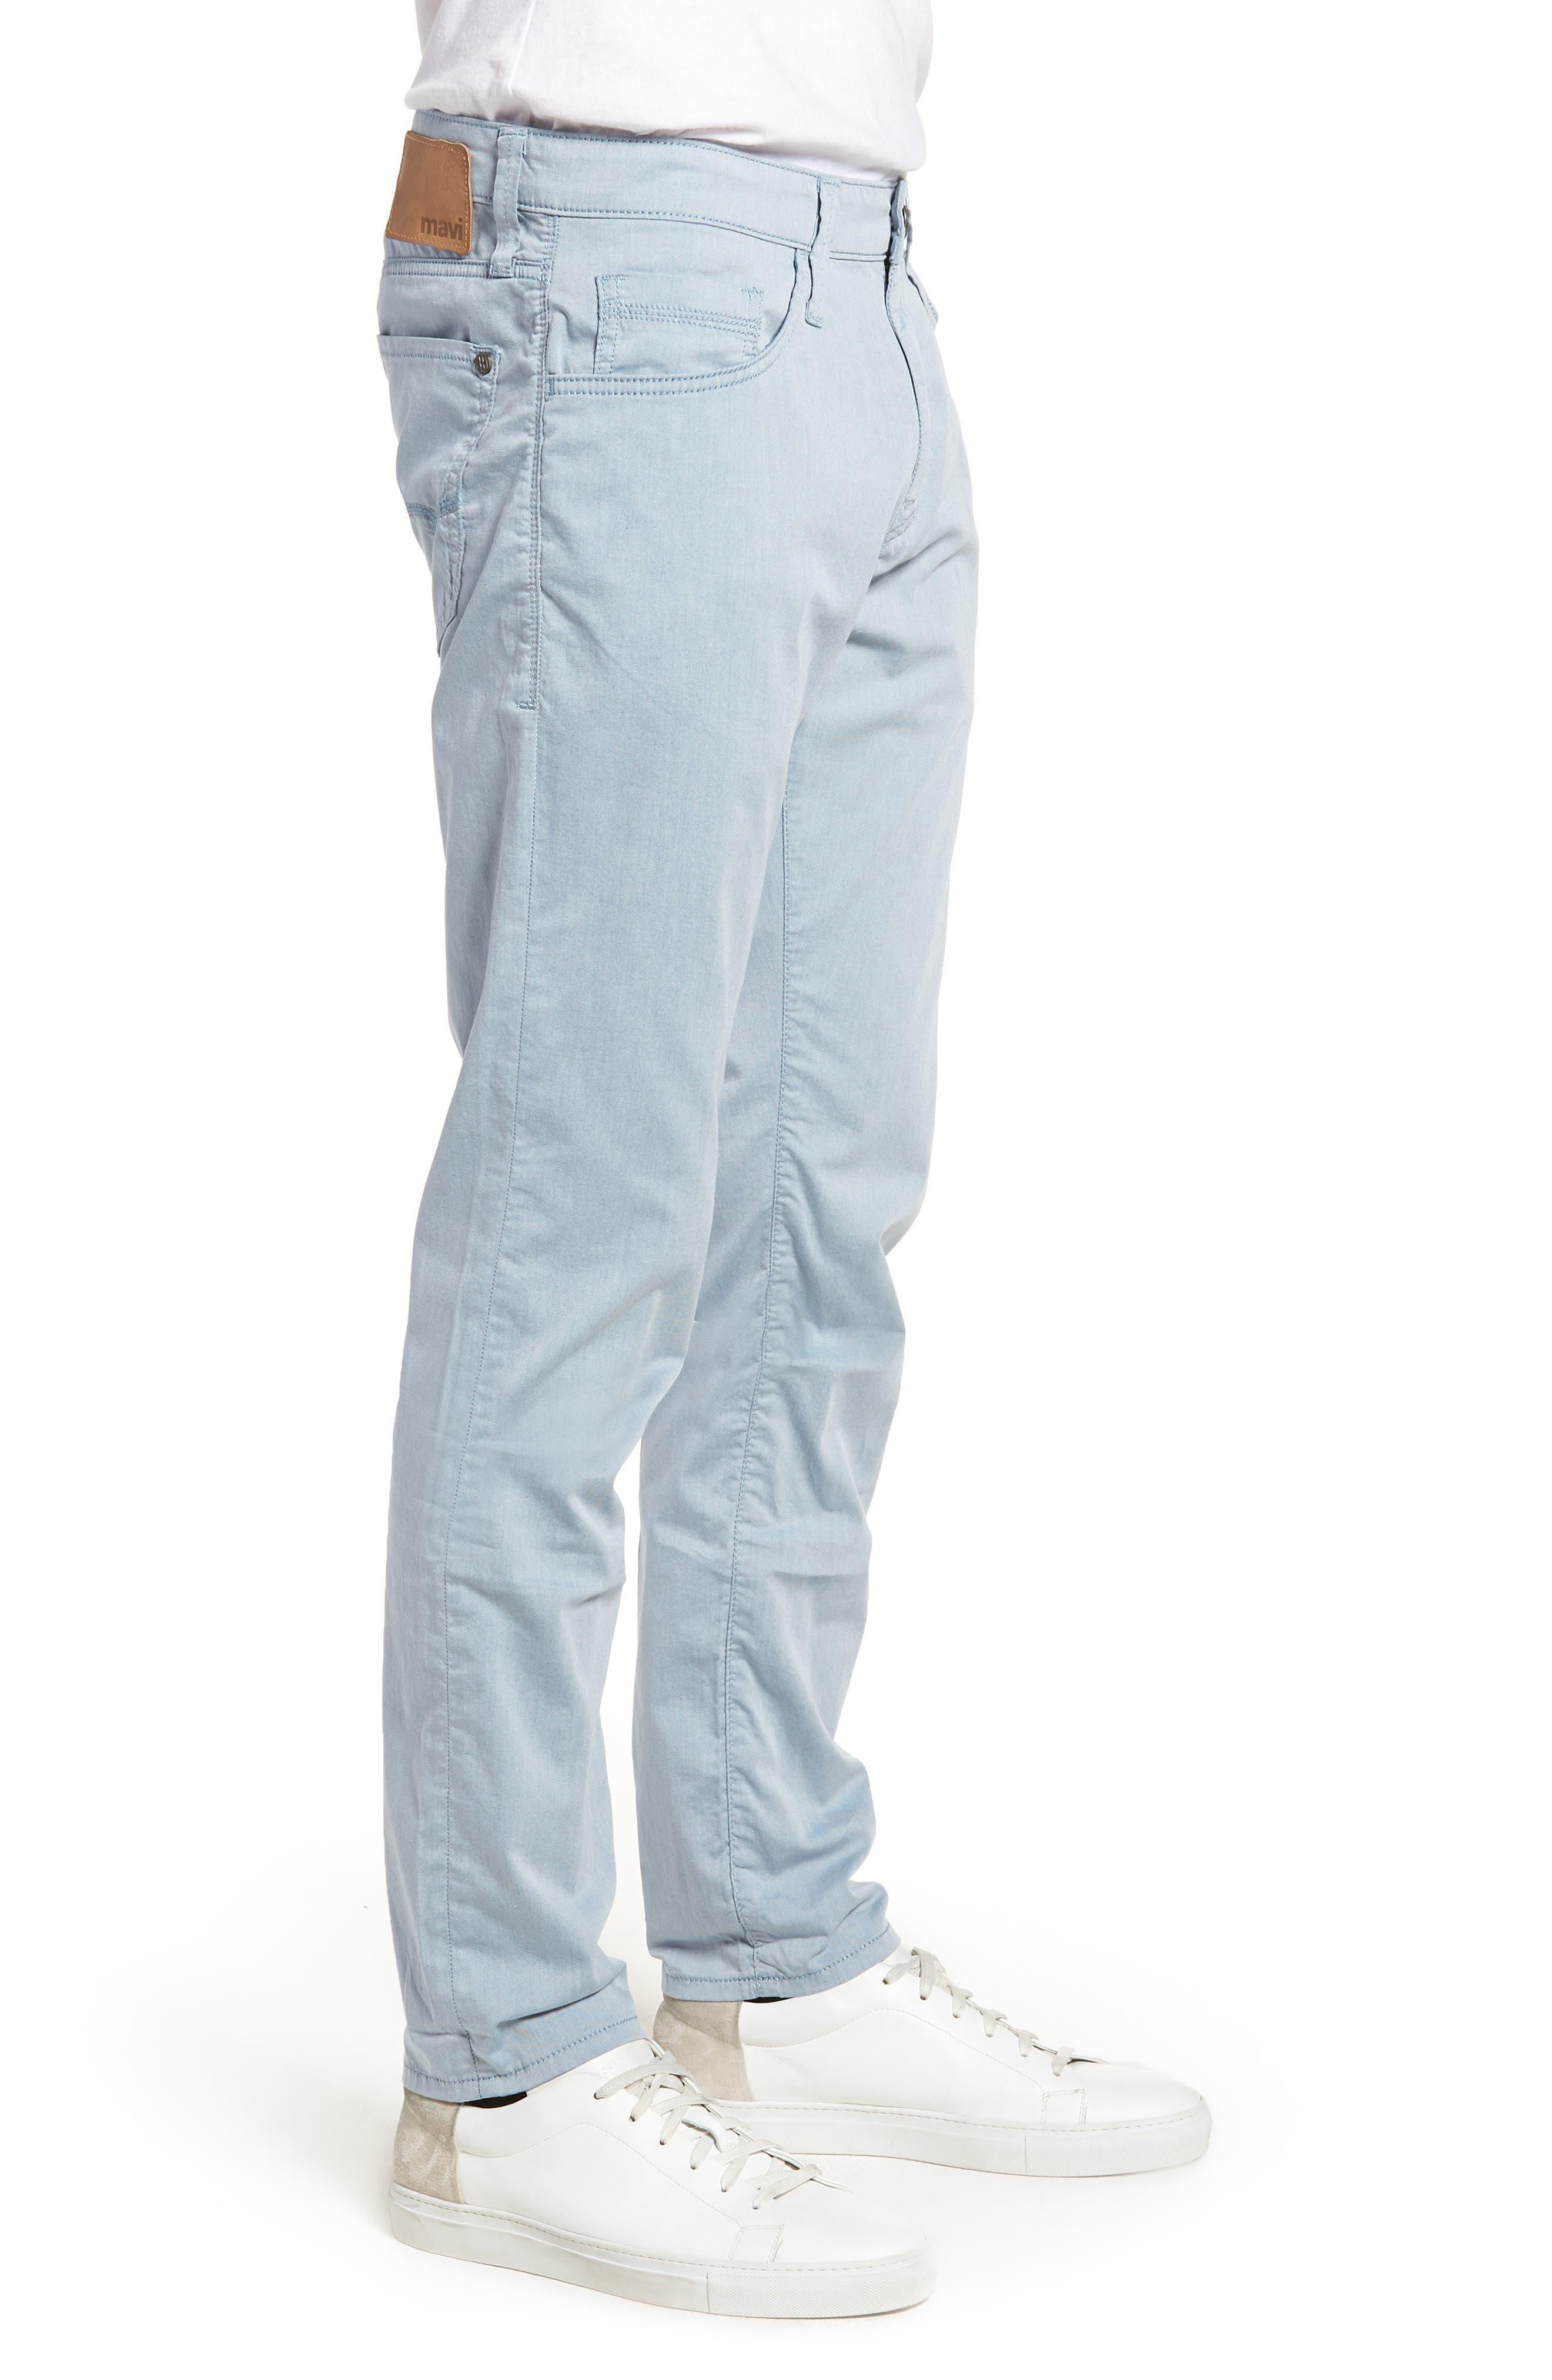 Jake Slim Fit Jeans,                             Alternate thumbnail 3, color,                             Blue Reversed